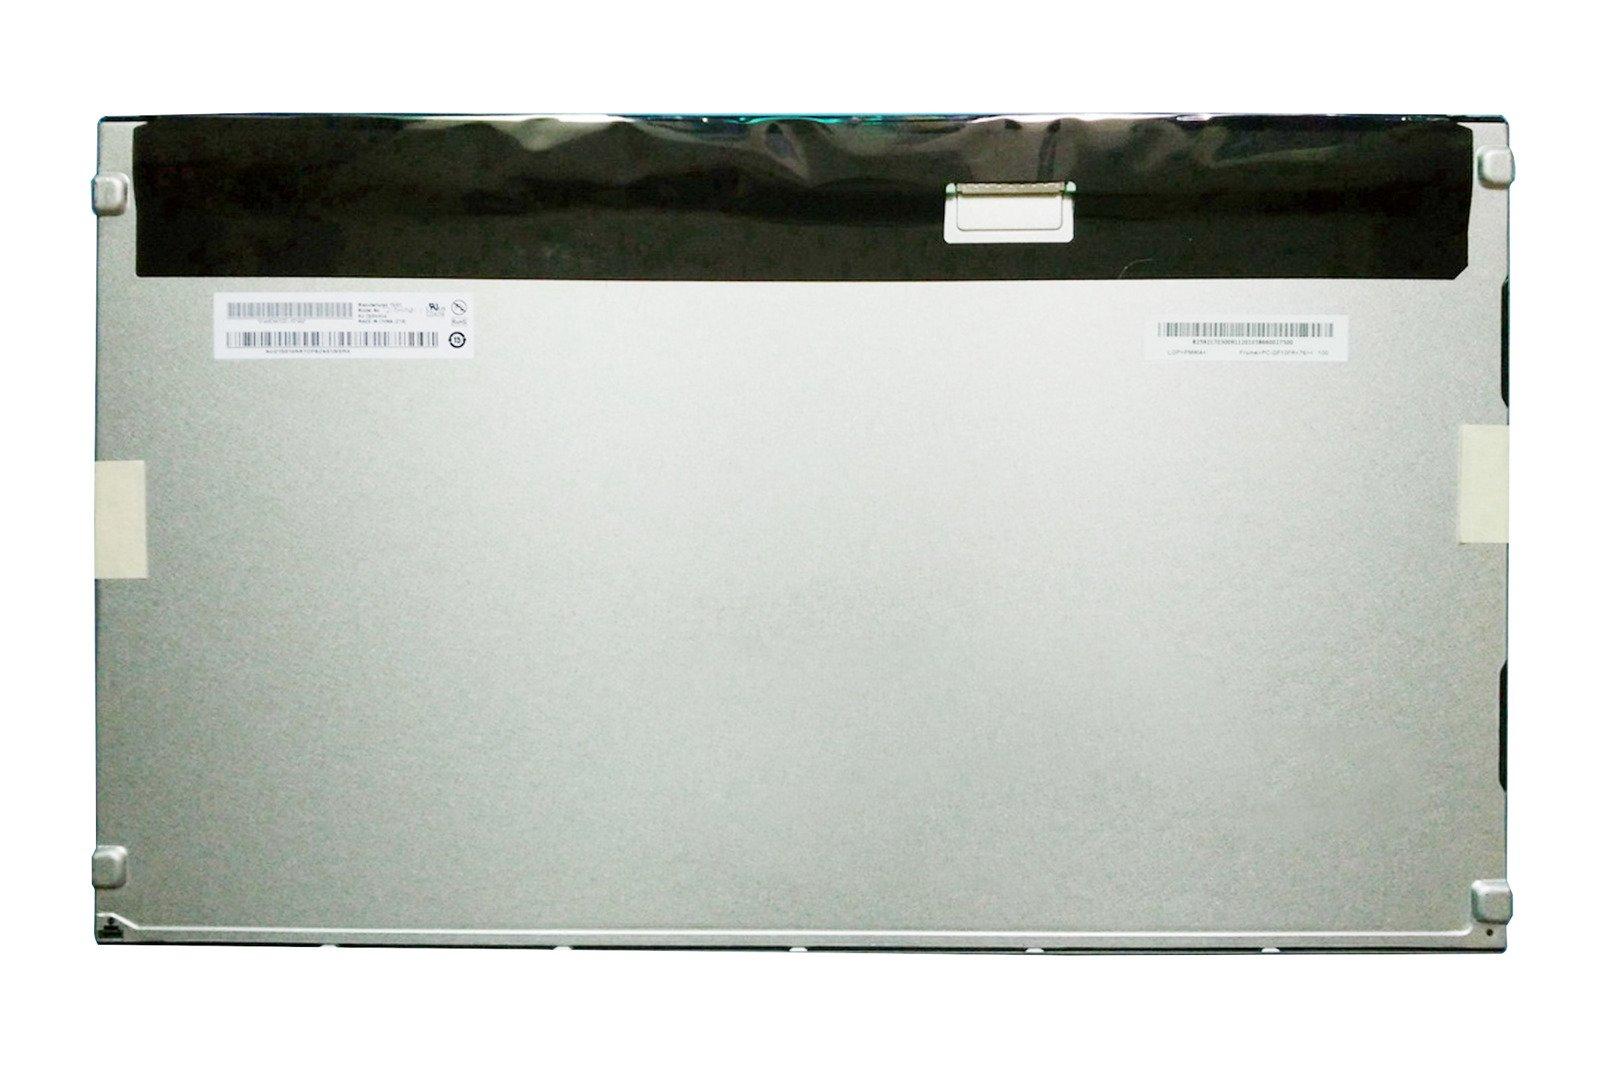 Bildschirm Display AUO 21.5' T215HVN01.1 1920 x 1080